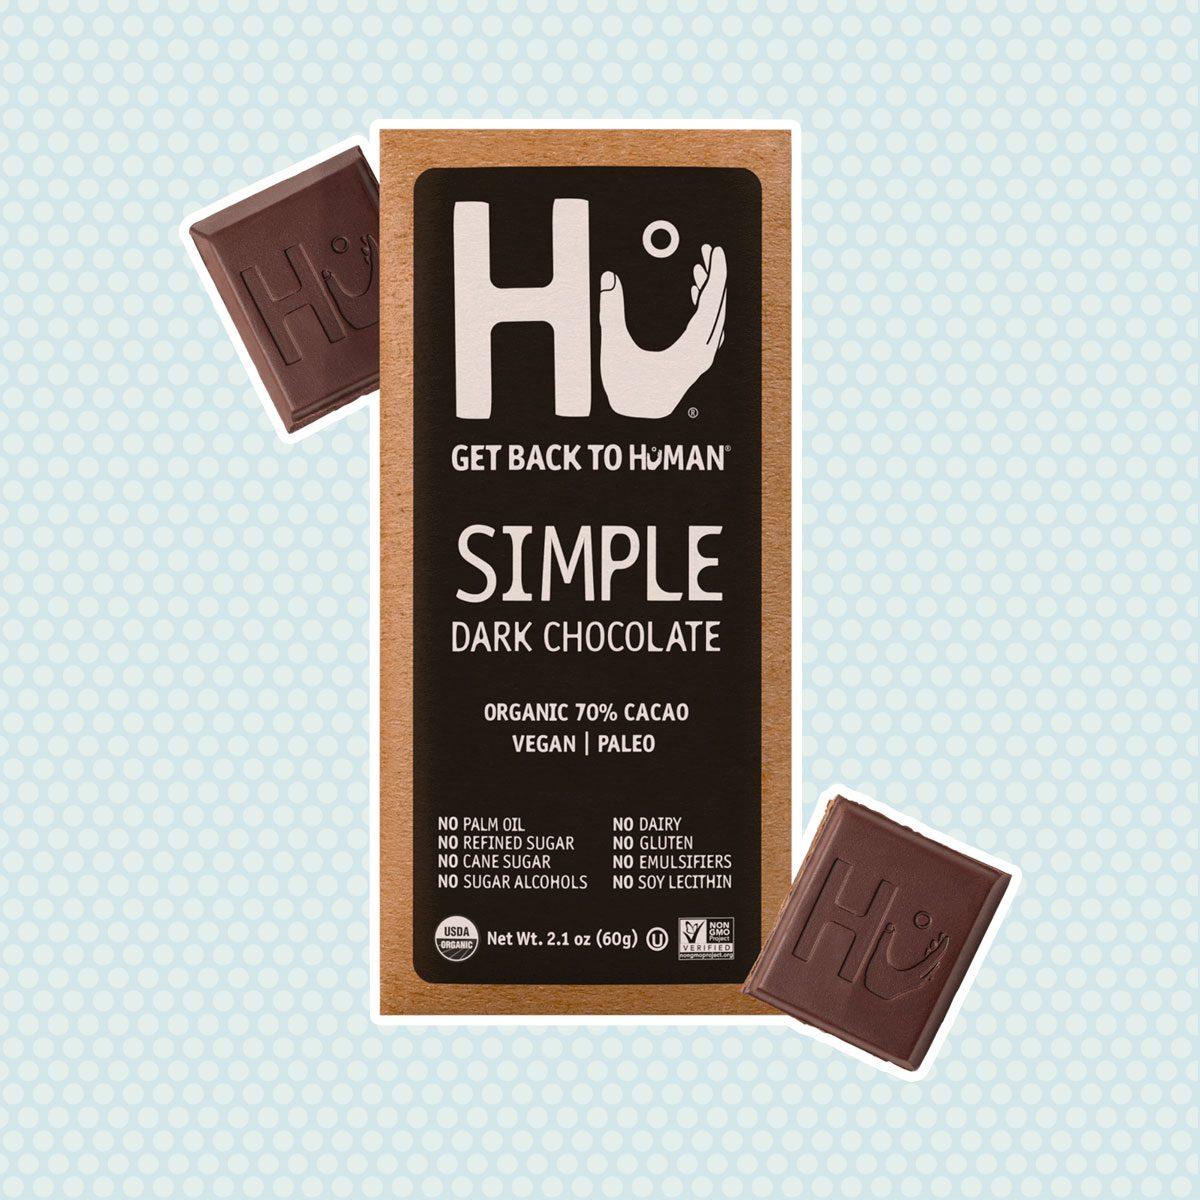 Hu Simple Dark Chocolate